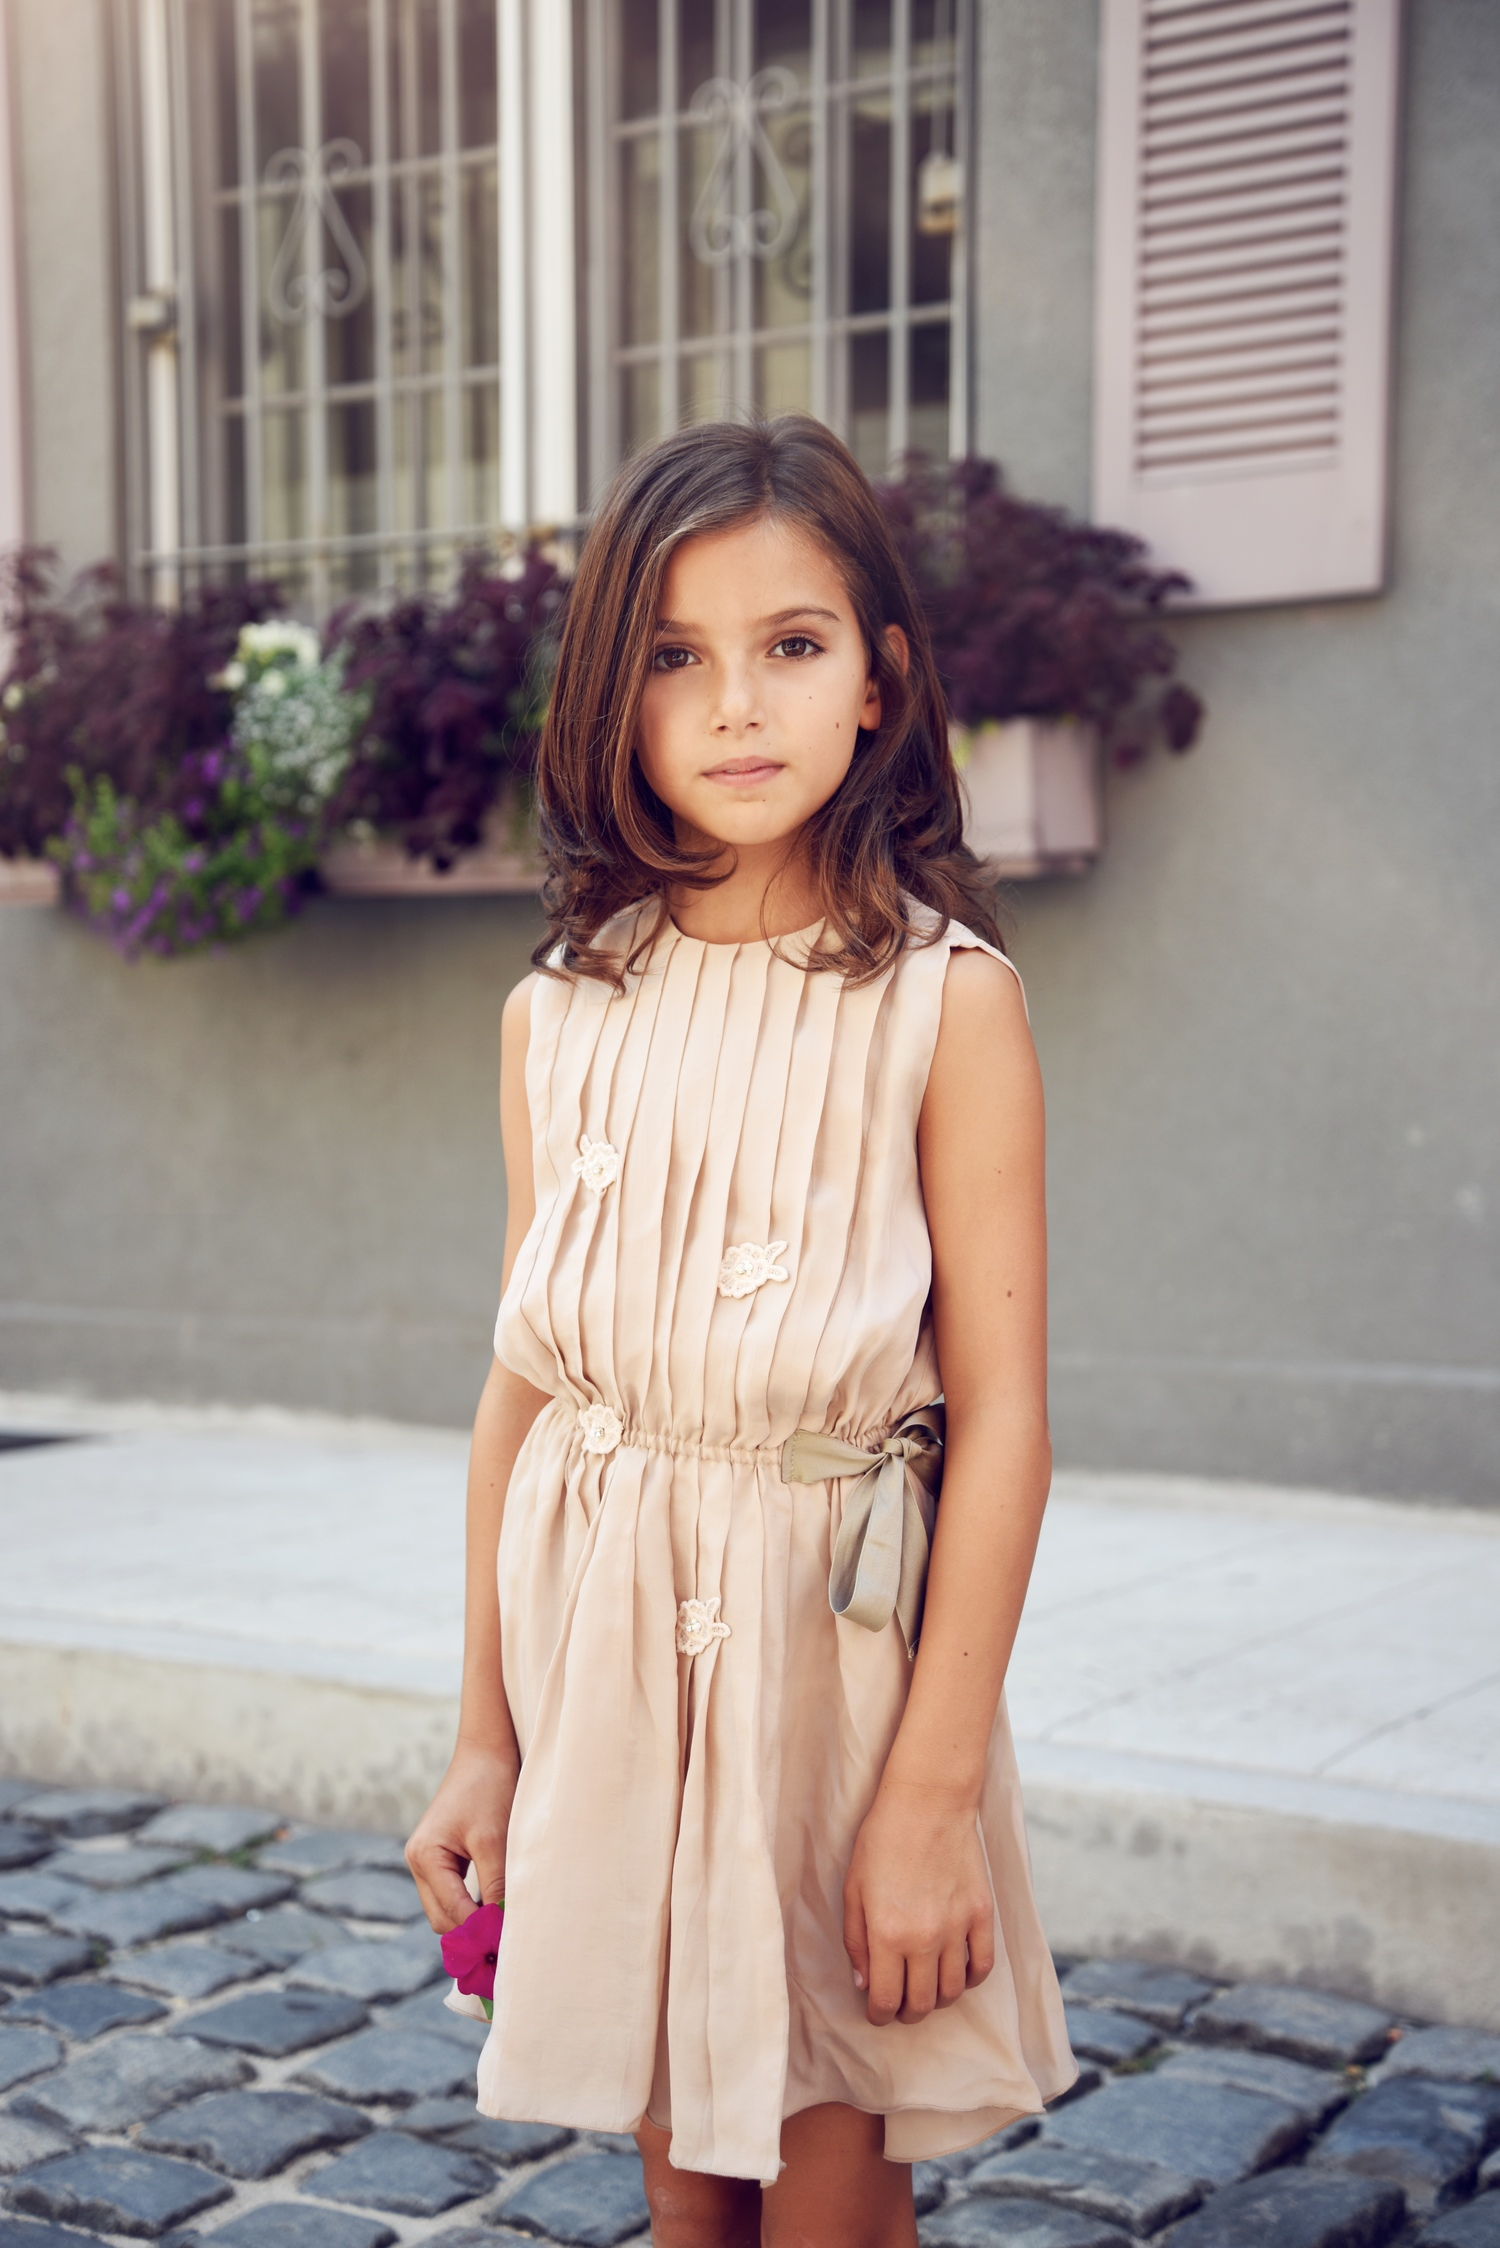 Enfant+Street+Style+by+Gina+Kim+Photography+Lamantine+Paris+dress.jpeg